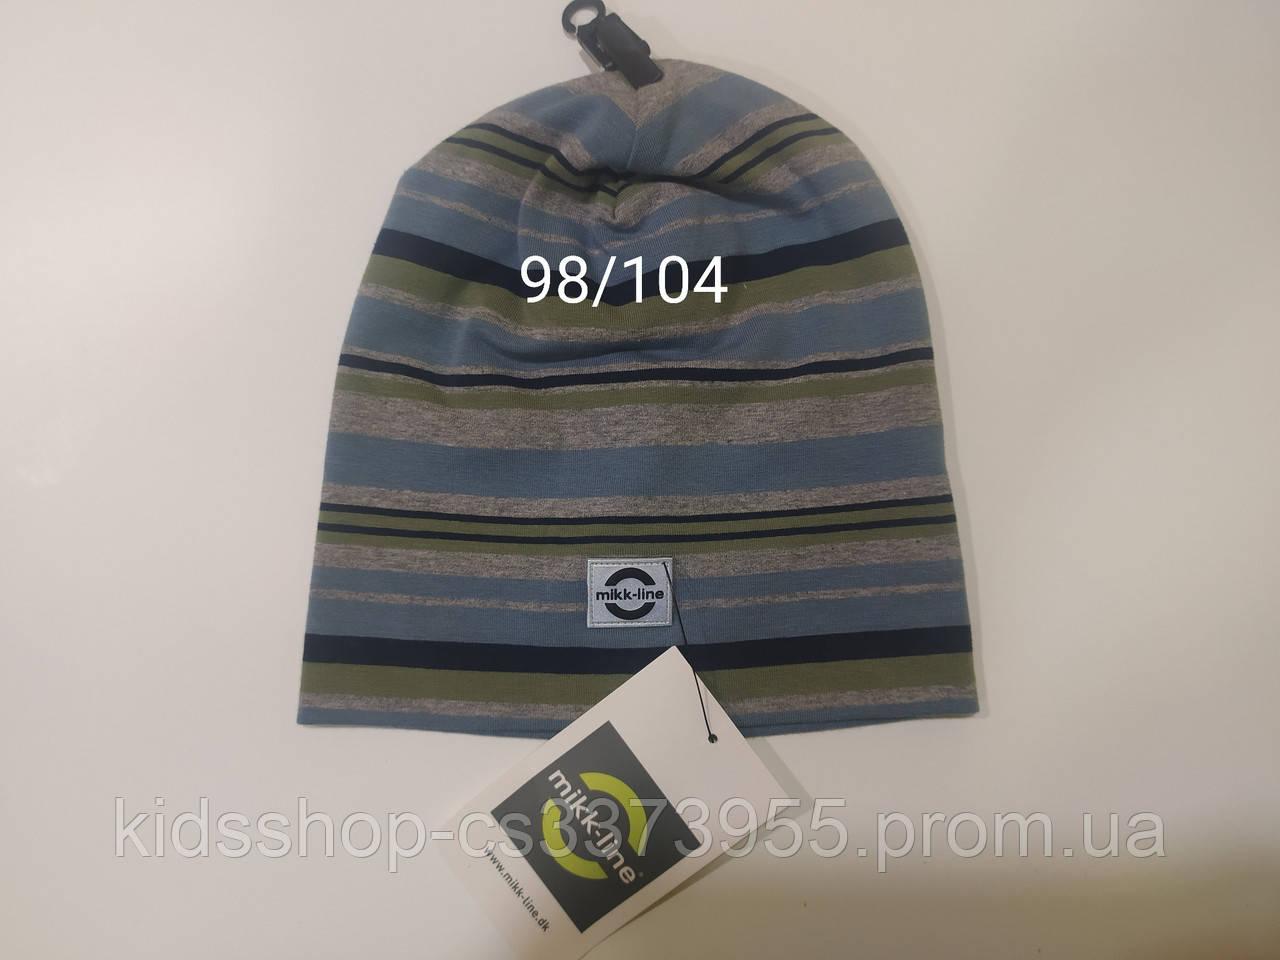 Шапка осень-зима детская размер 98/104